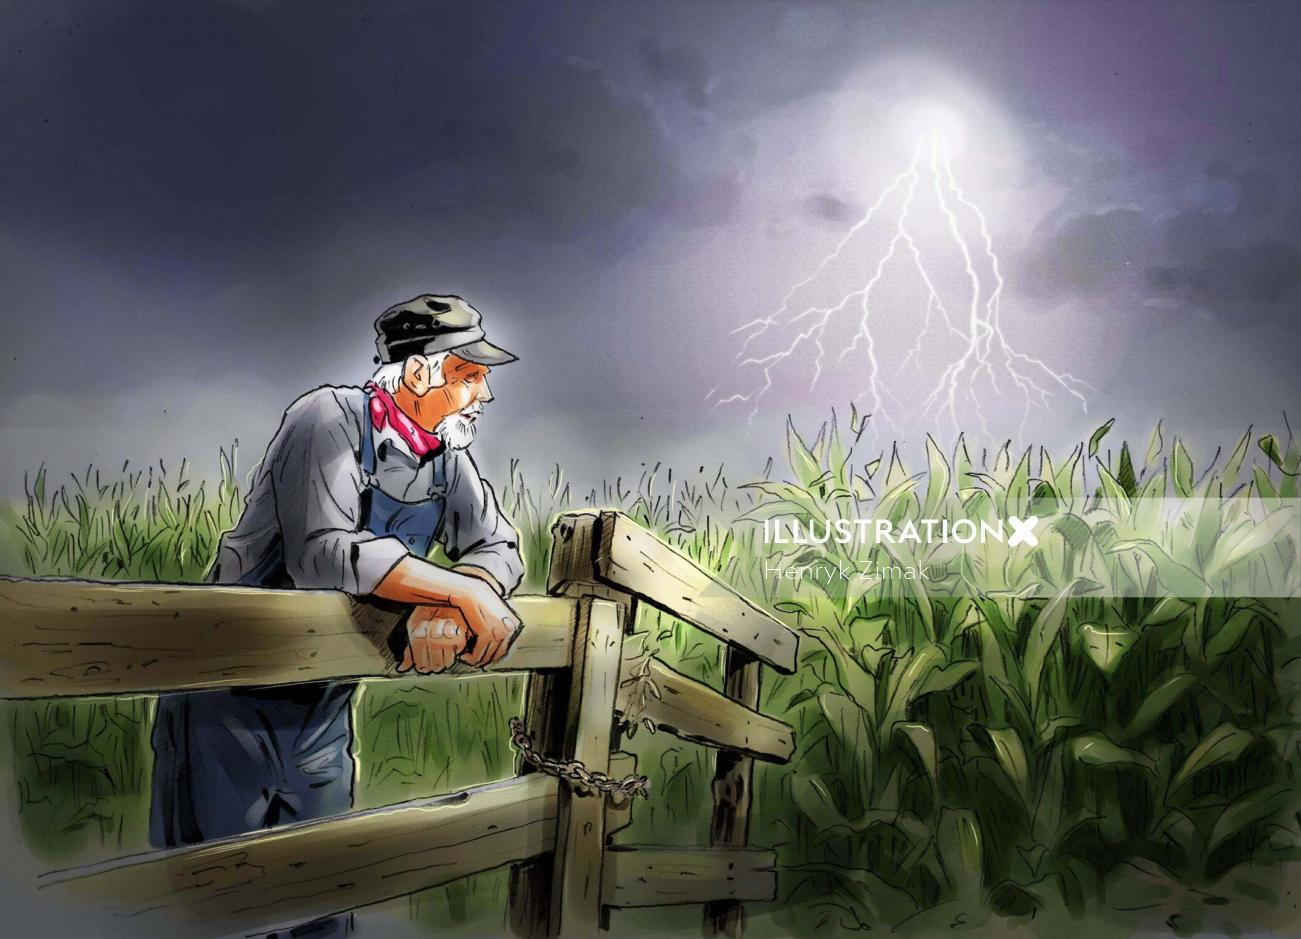 Standing in farm